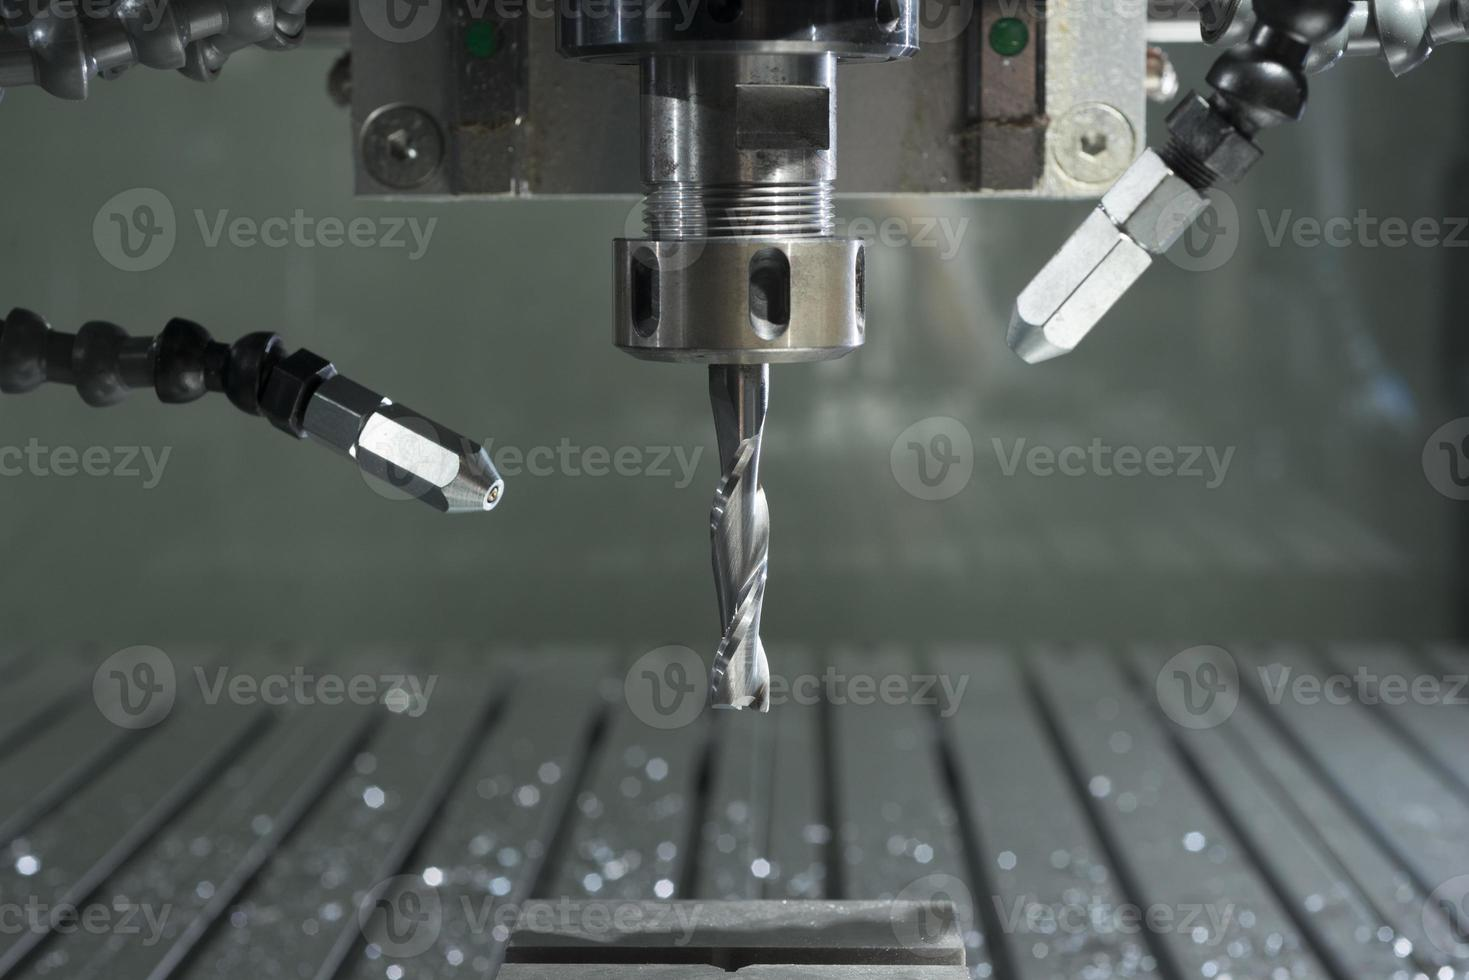 industriell CNC-fabrik automatiserad metallbearbetningsmaskin foto